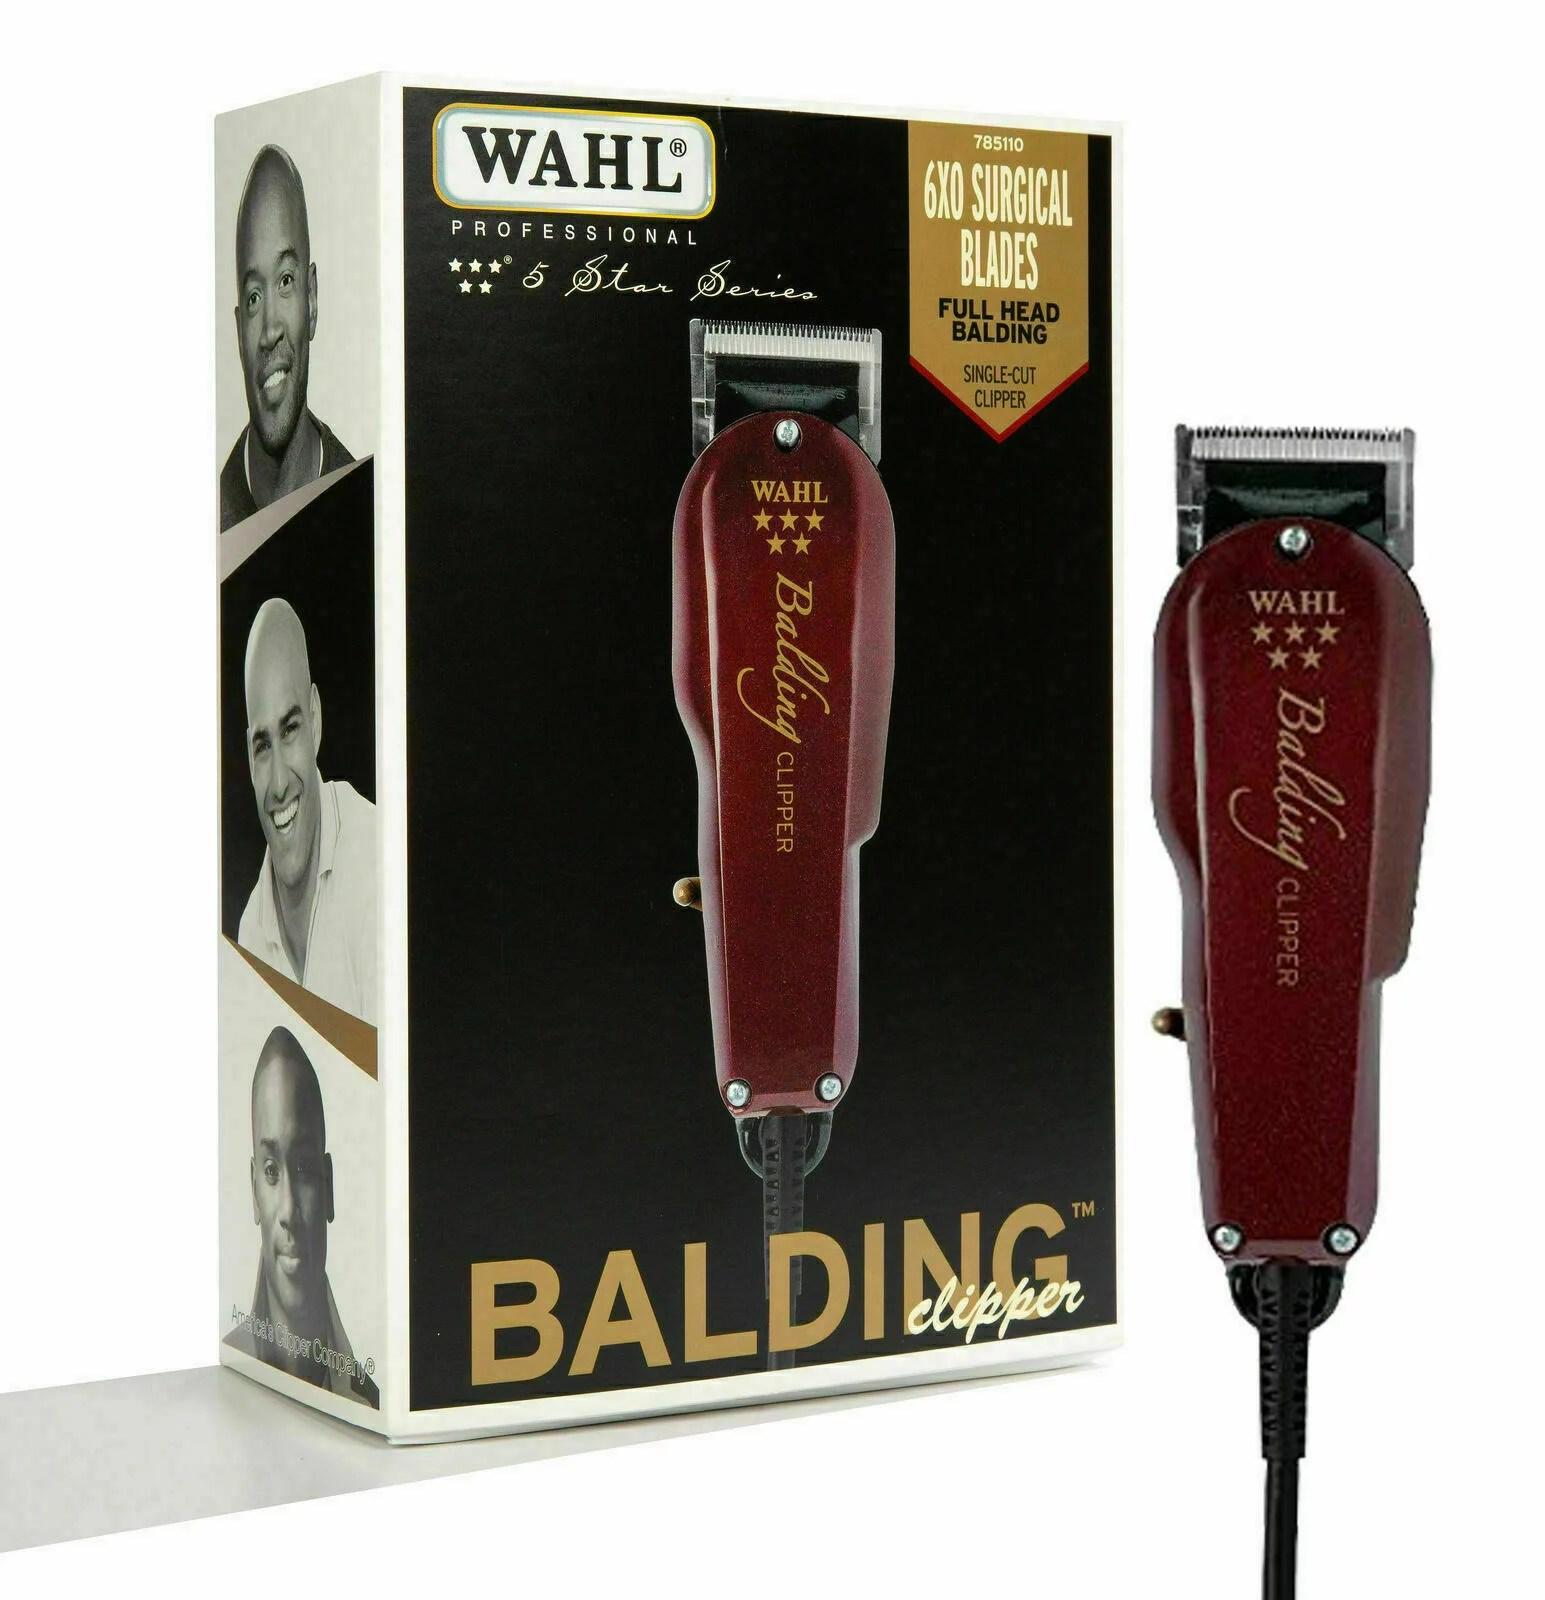 Wahl 5 Star Balding